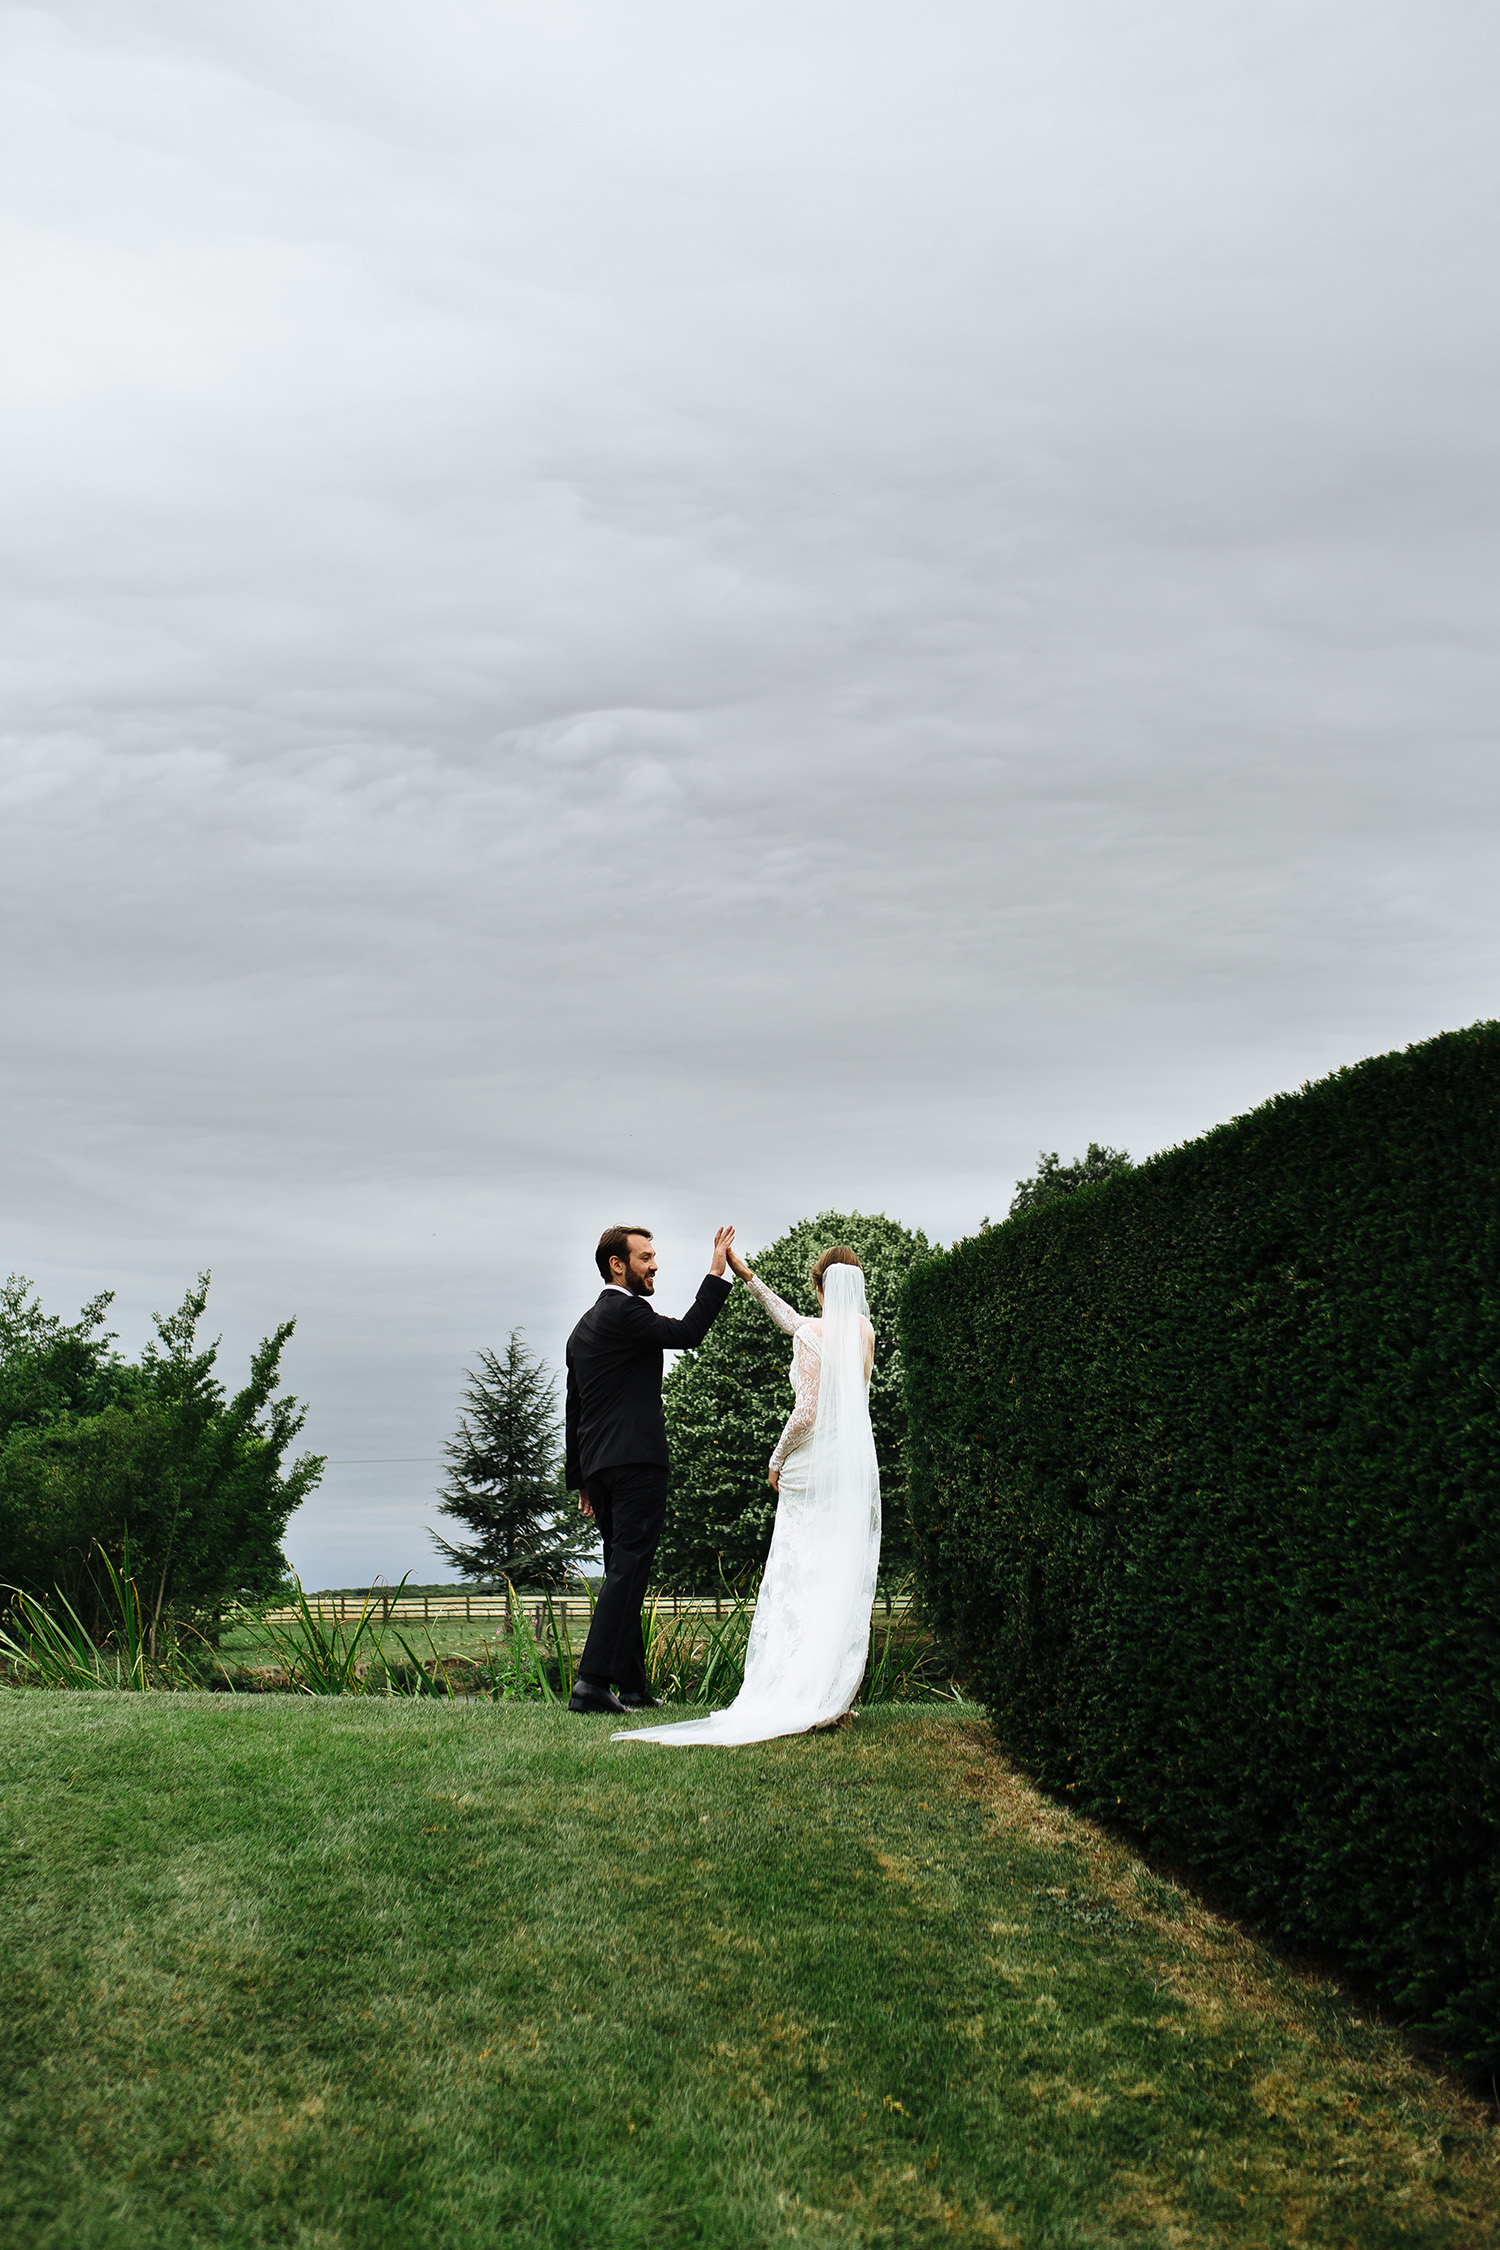 CHILDERLEY HALL CAMBRIDGE WEDDING 52.JPG